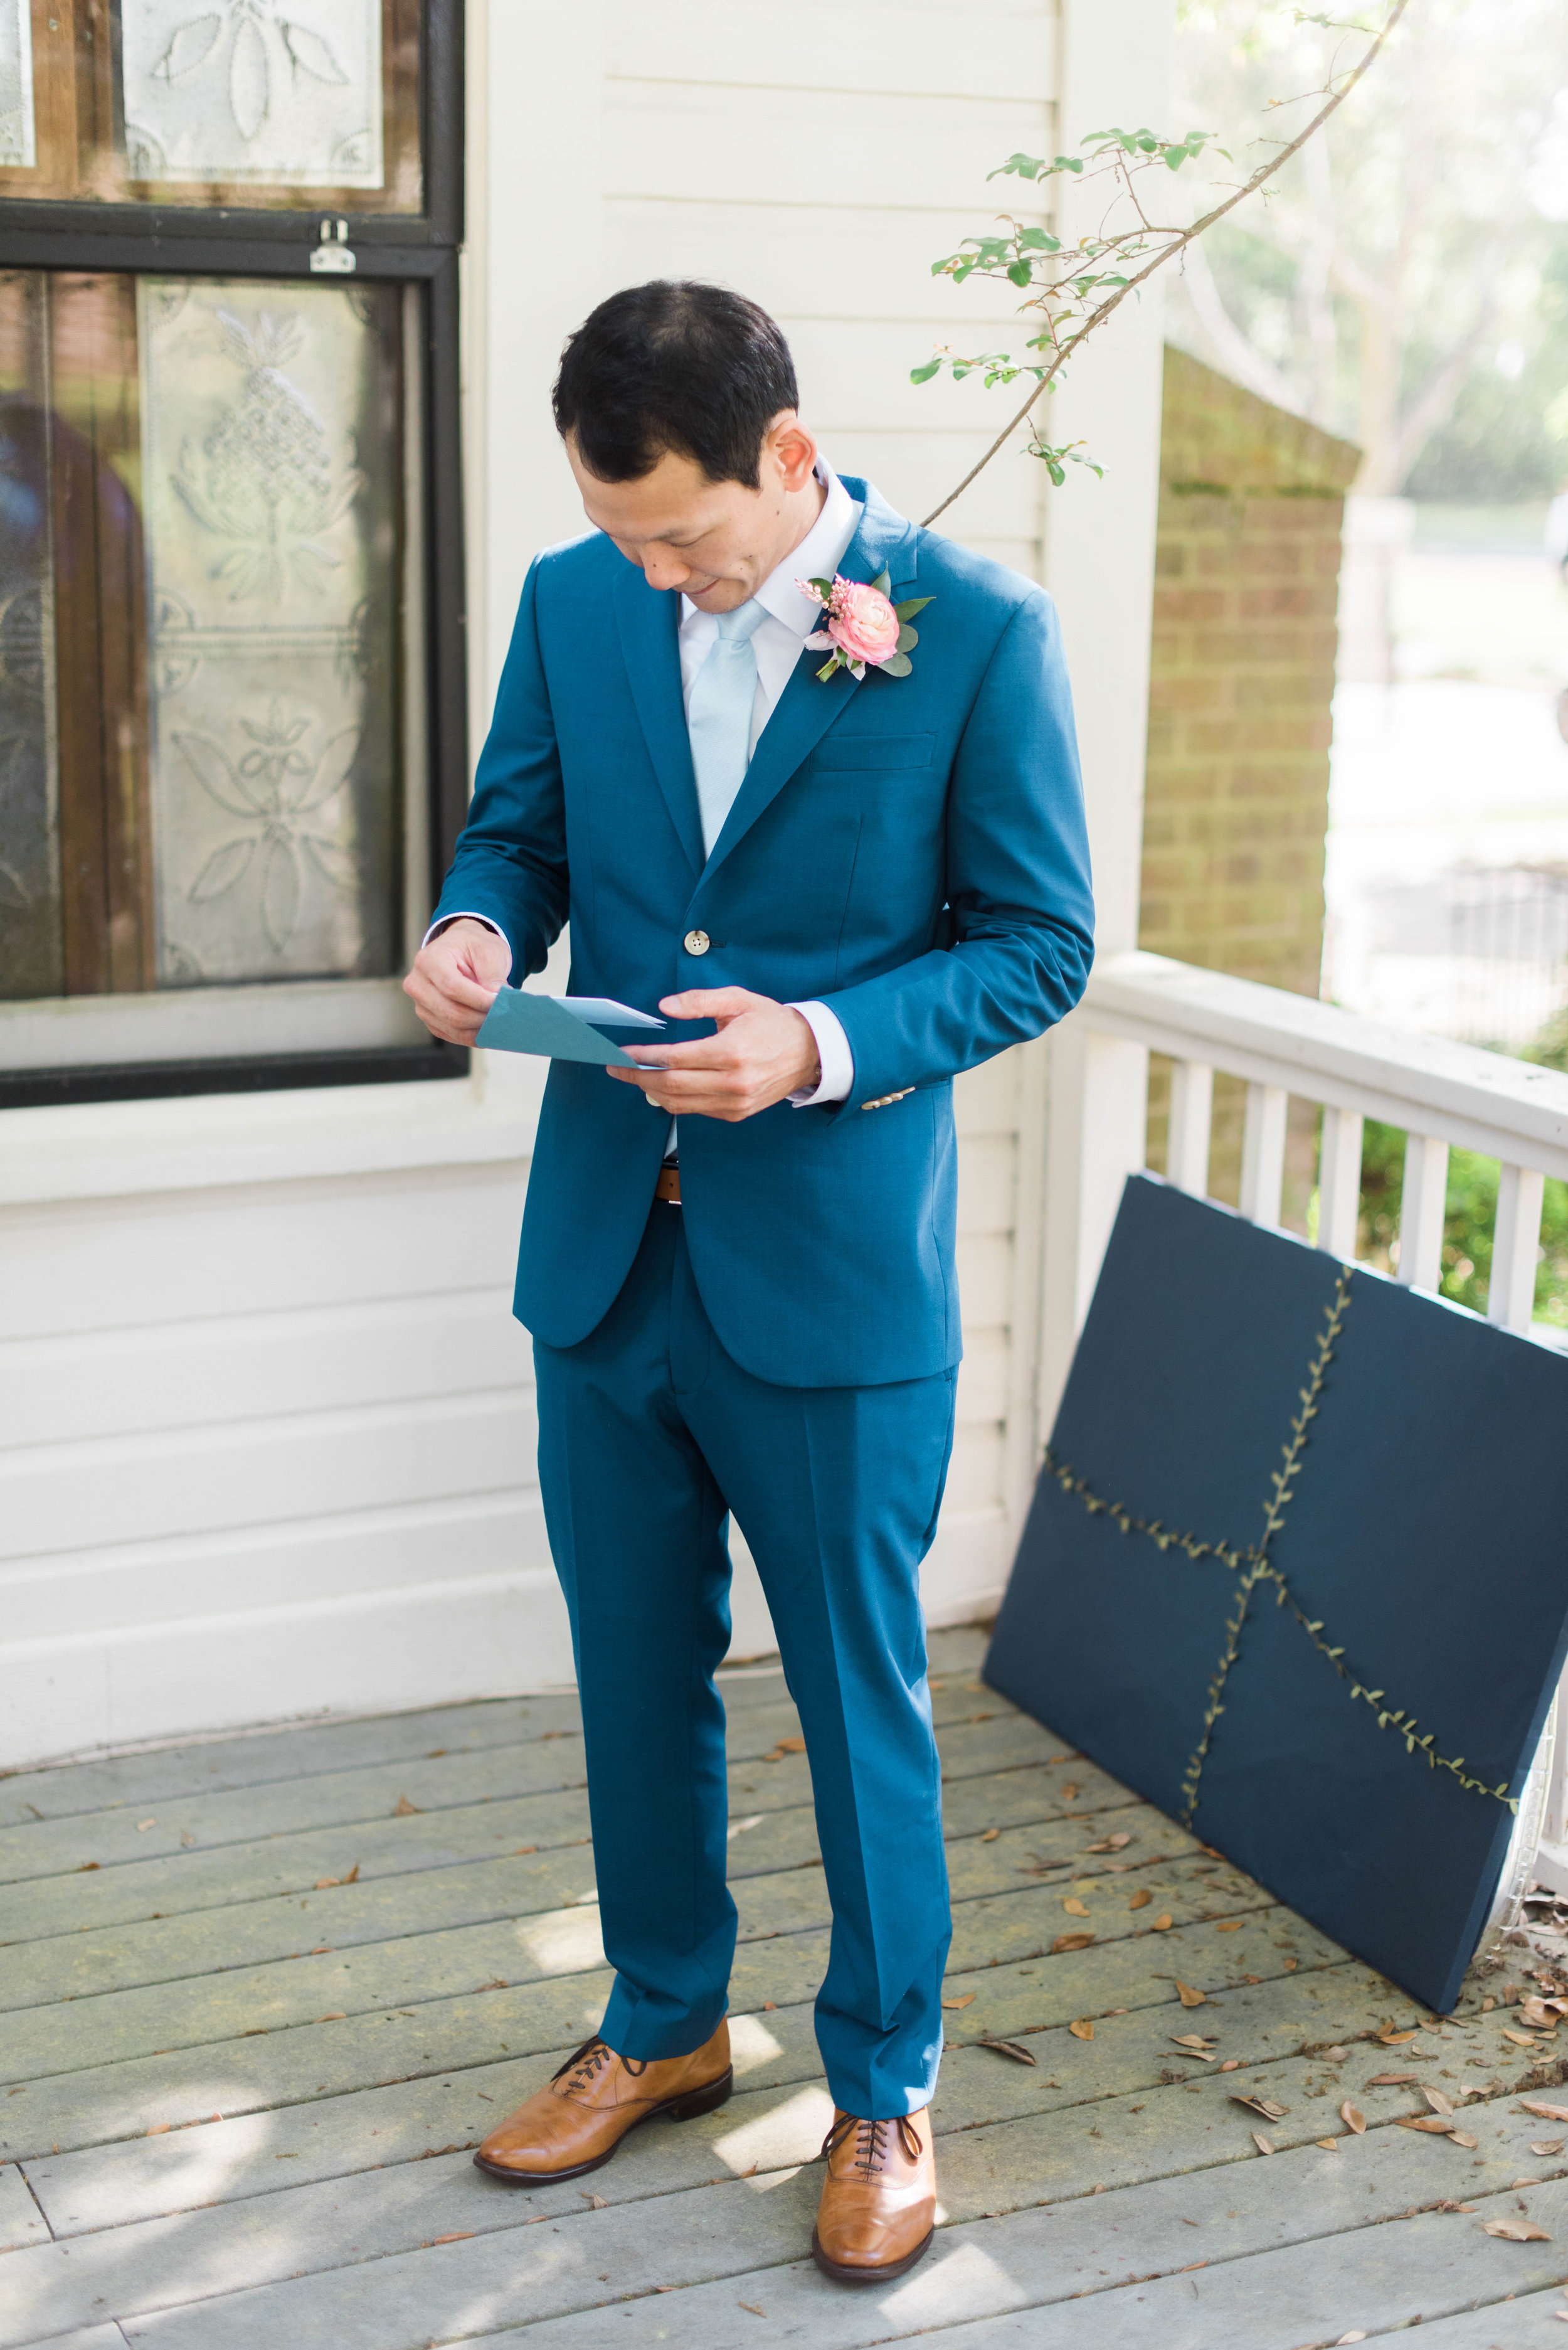 The-Knot-50-Weddings-50-States-Texas-Winner-Dana-Fernandez-photography-houston-wedding-photographer-film-fine-art-destination-10.jpg